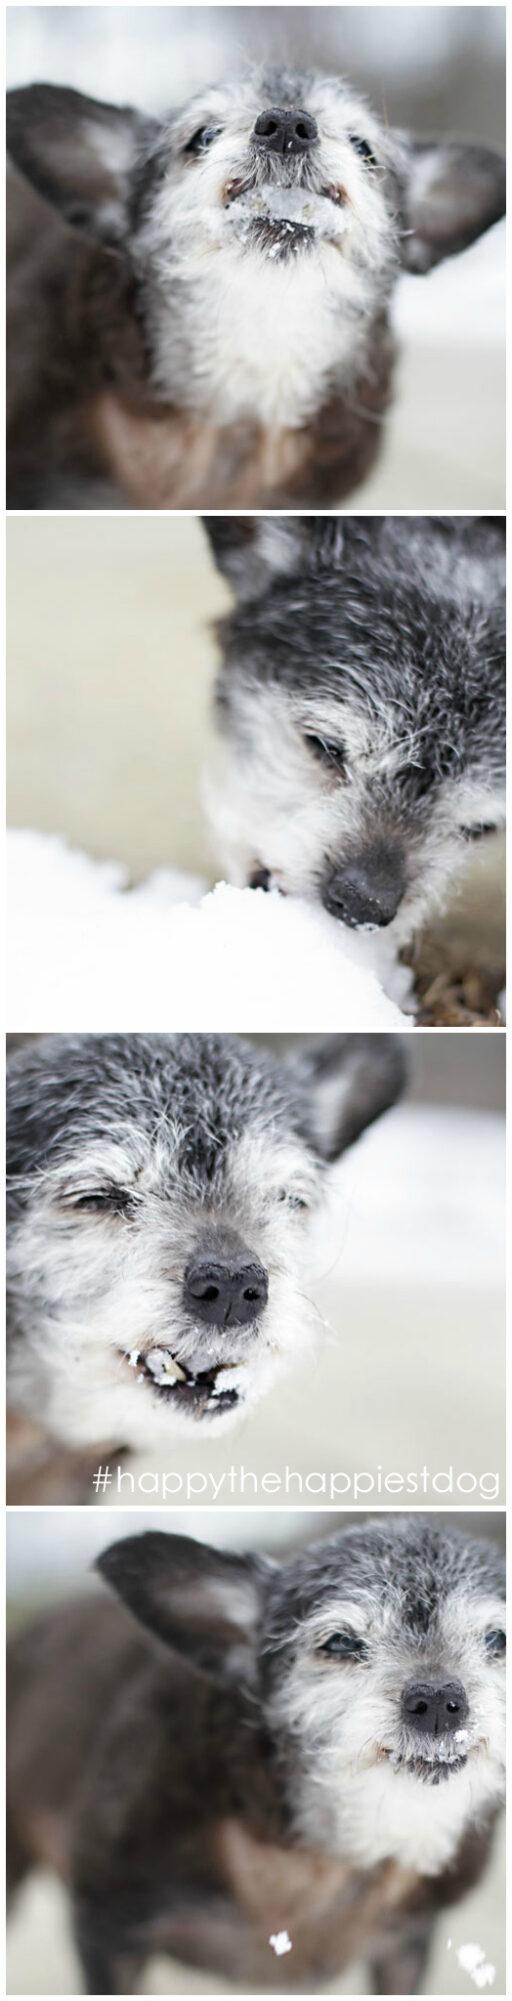 Happy the Happiest Dog - Senior Rescue - Dog Adoption